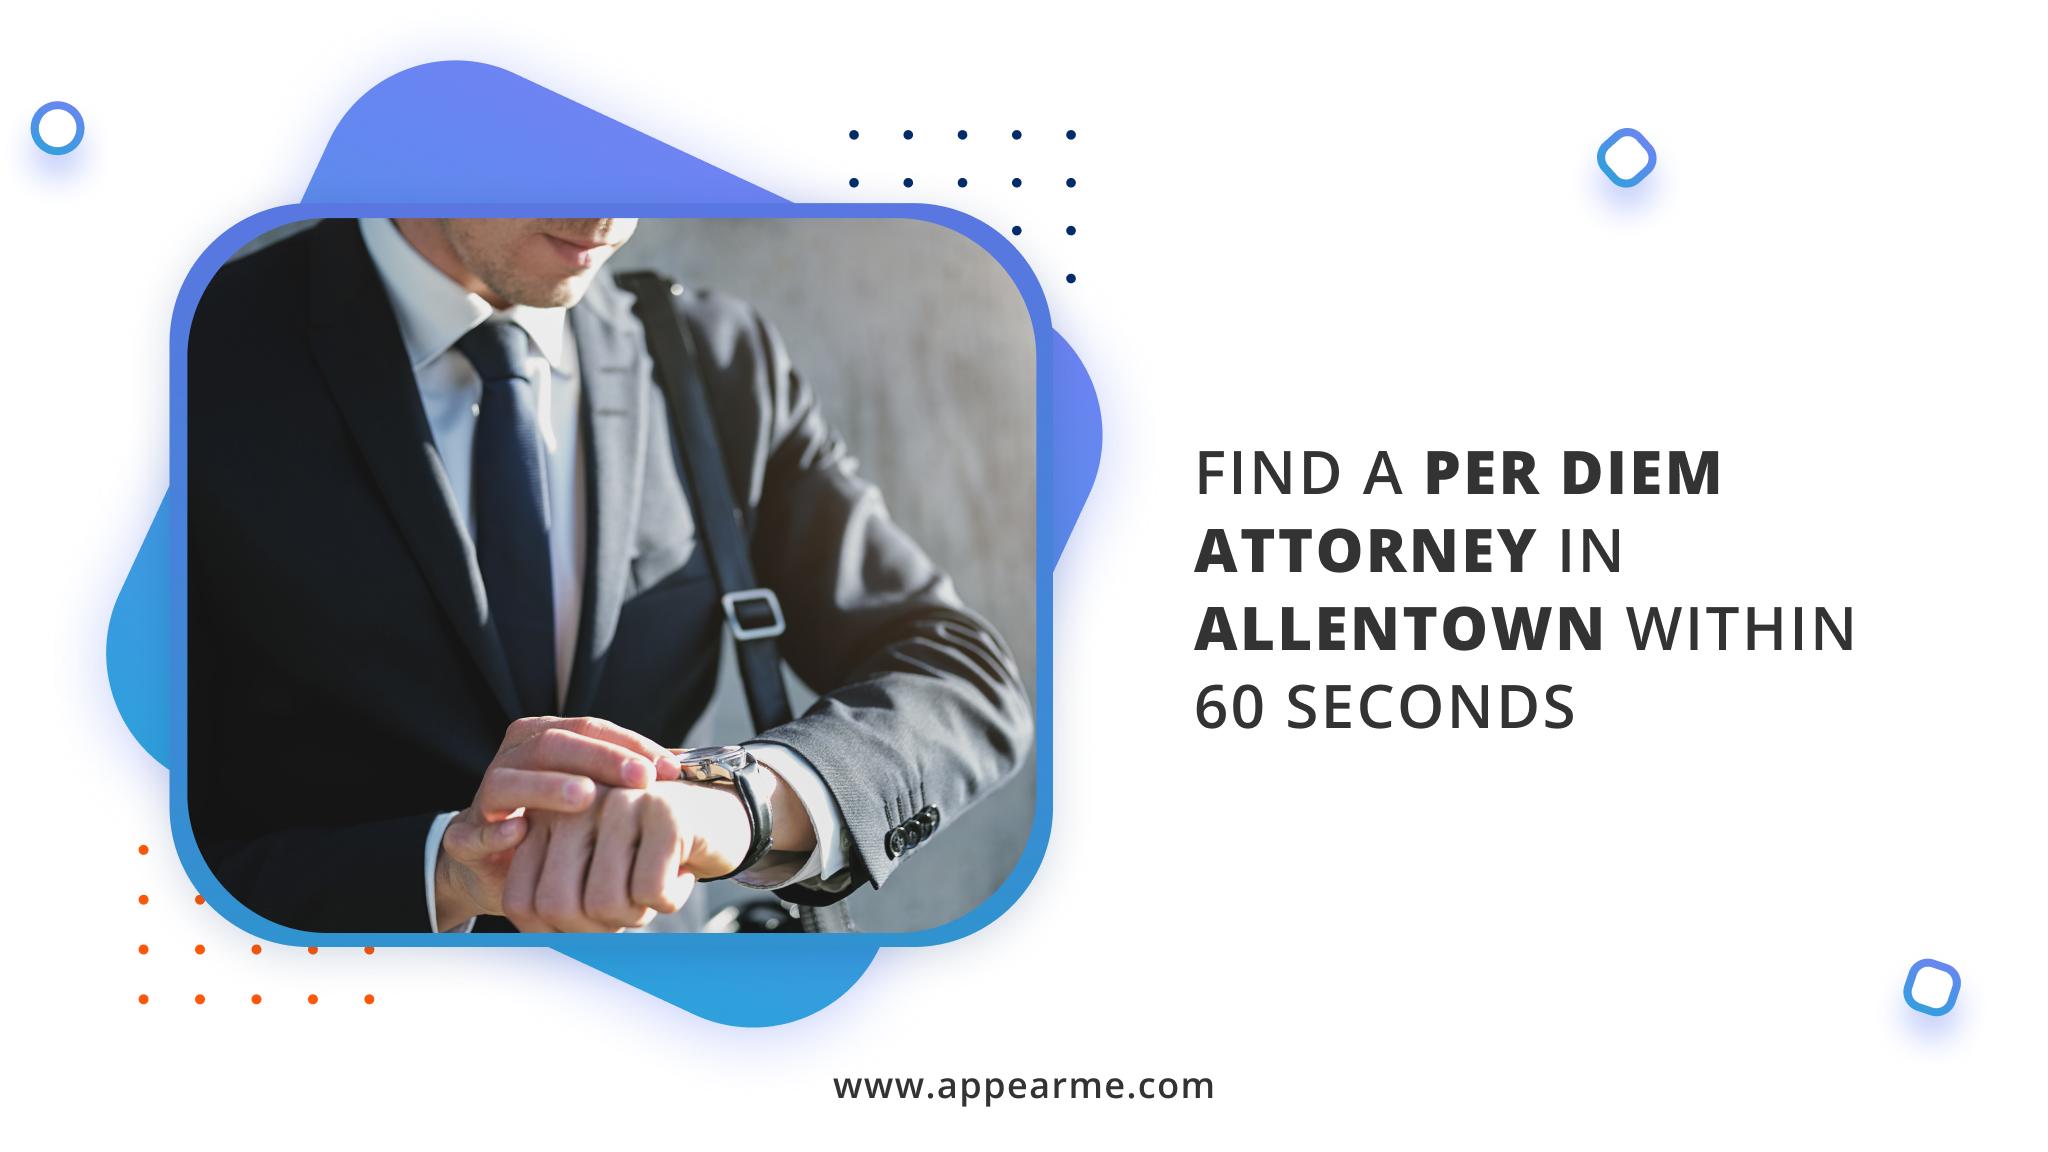 per diem attorney